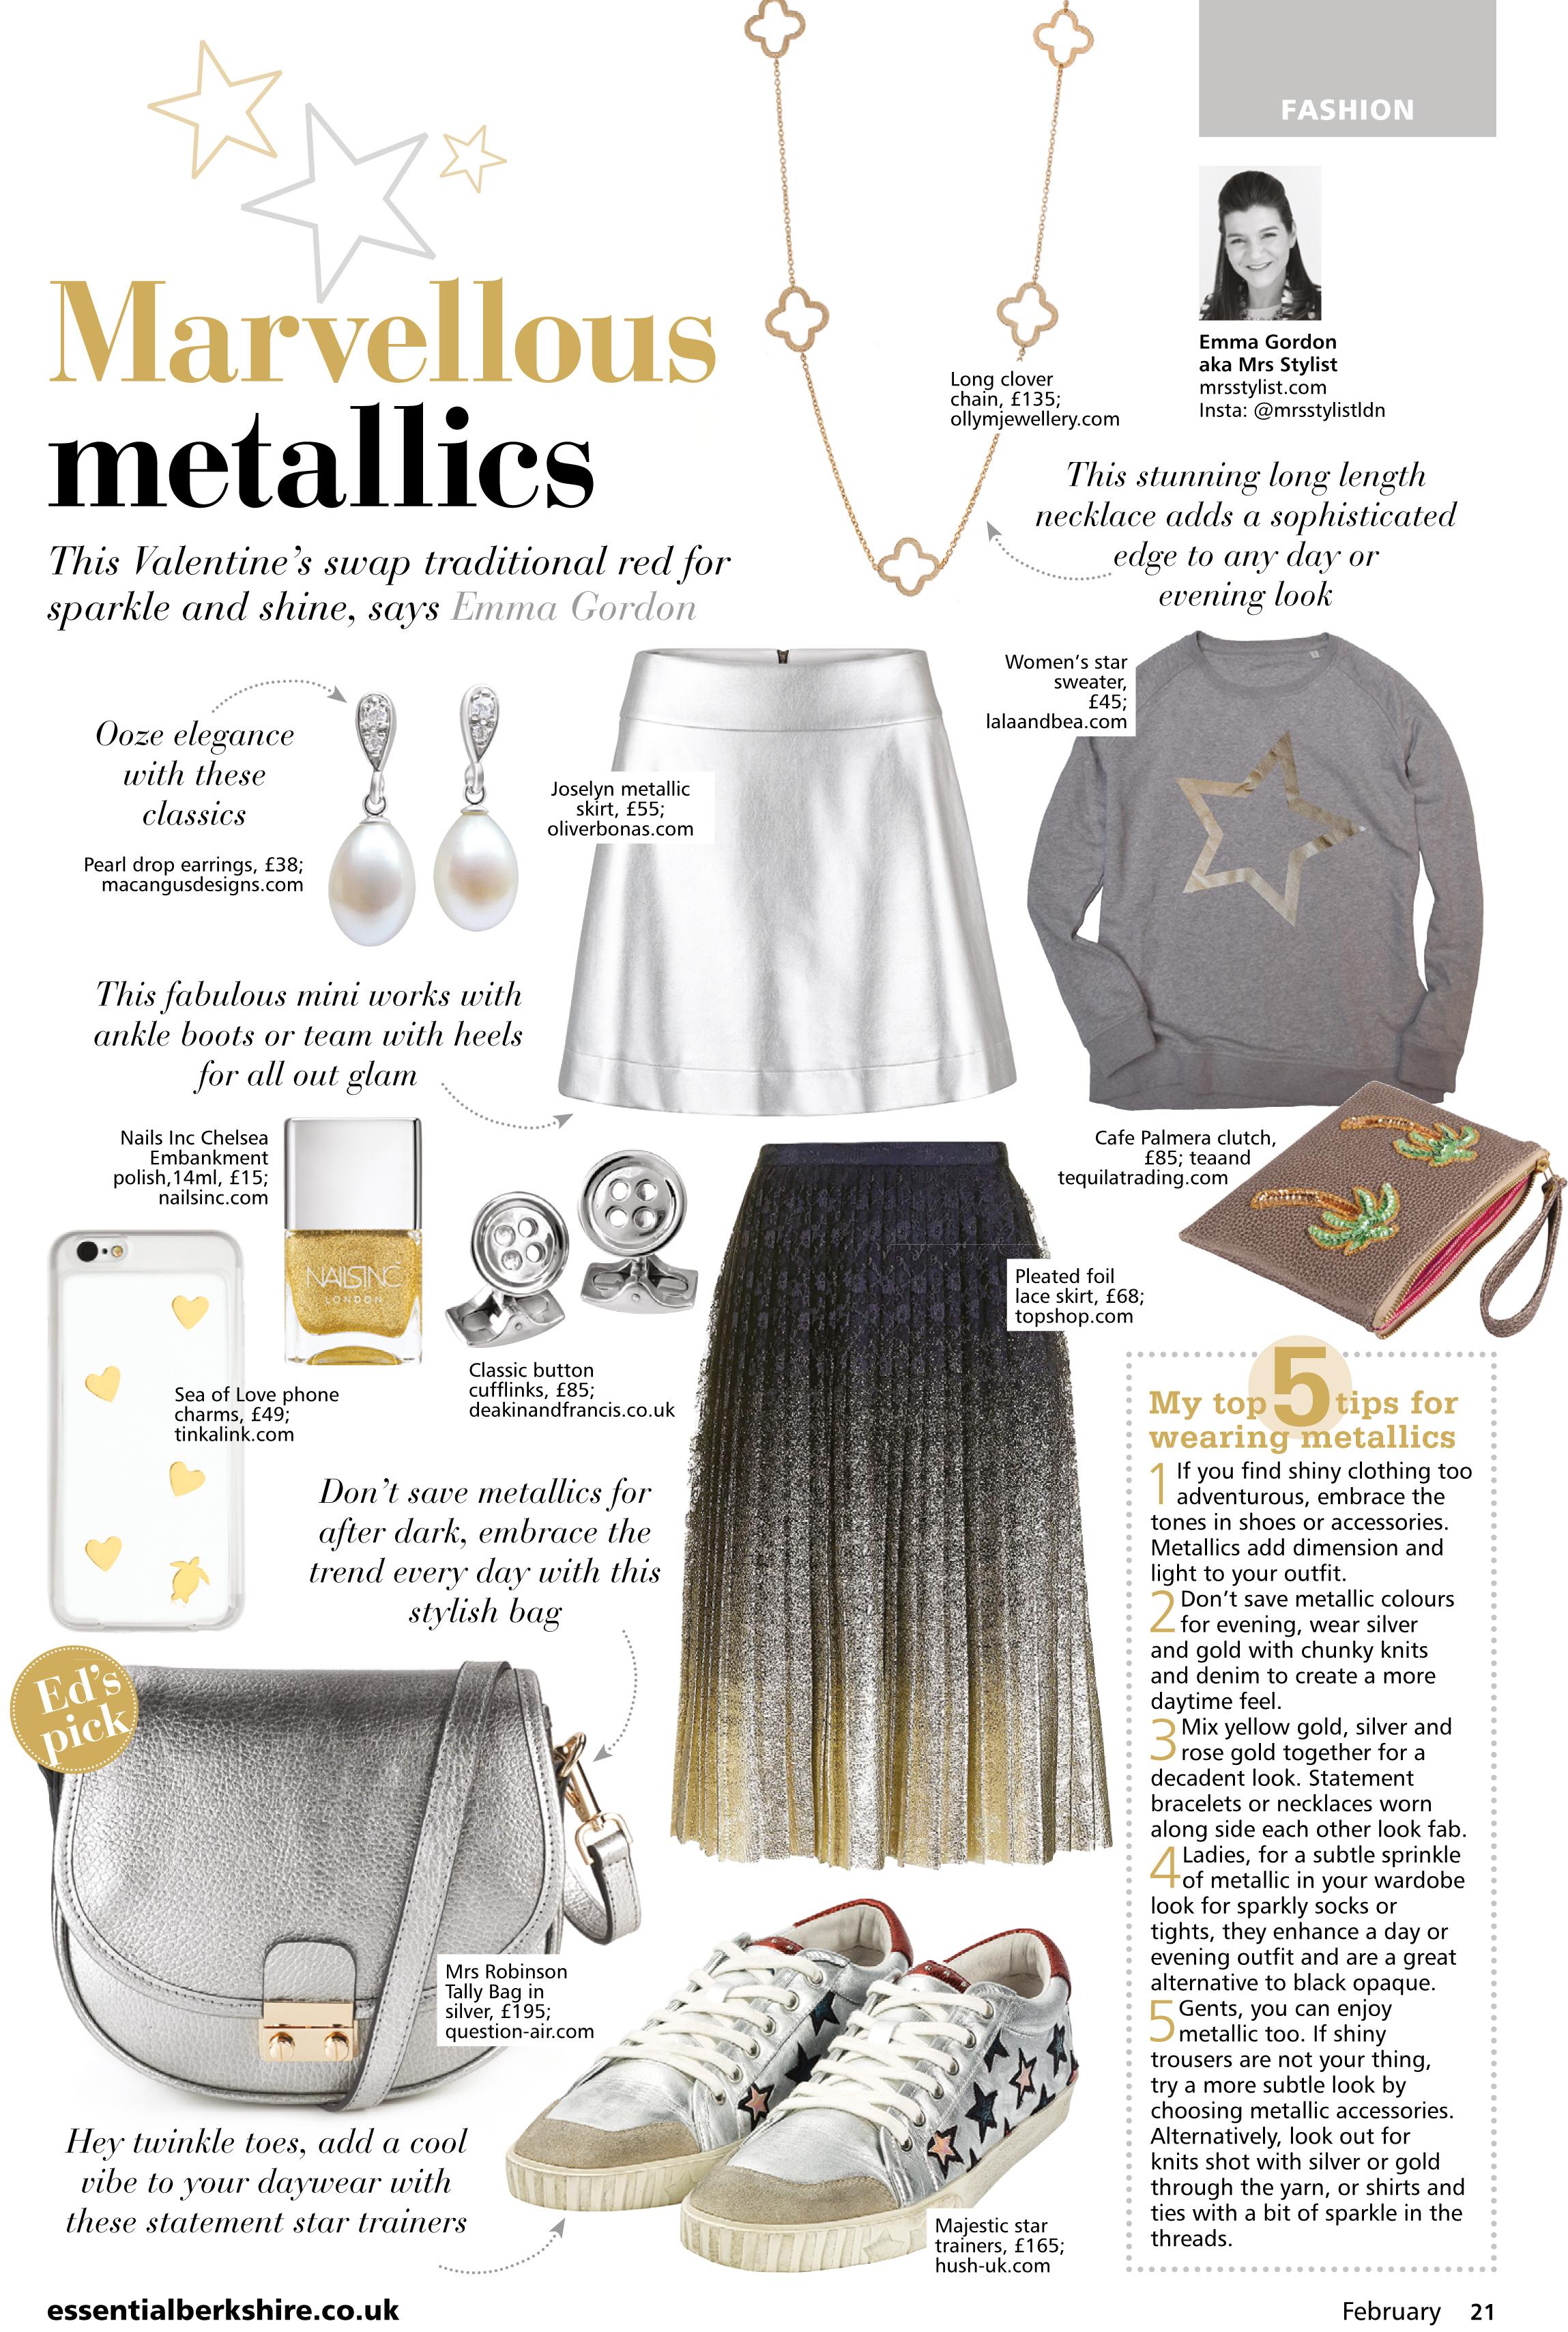 Marvellous Metallics Fashion Feb 2017 Sheengate Publishing.jpg